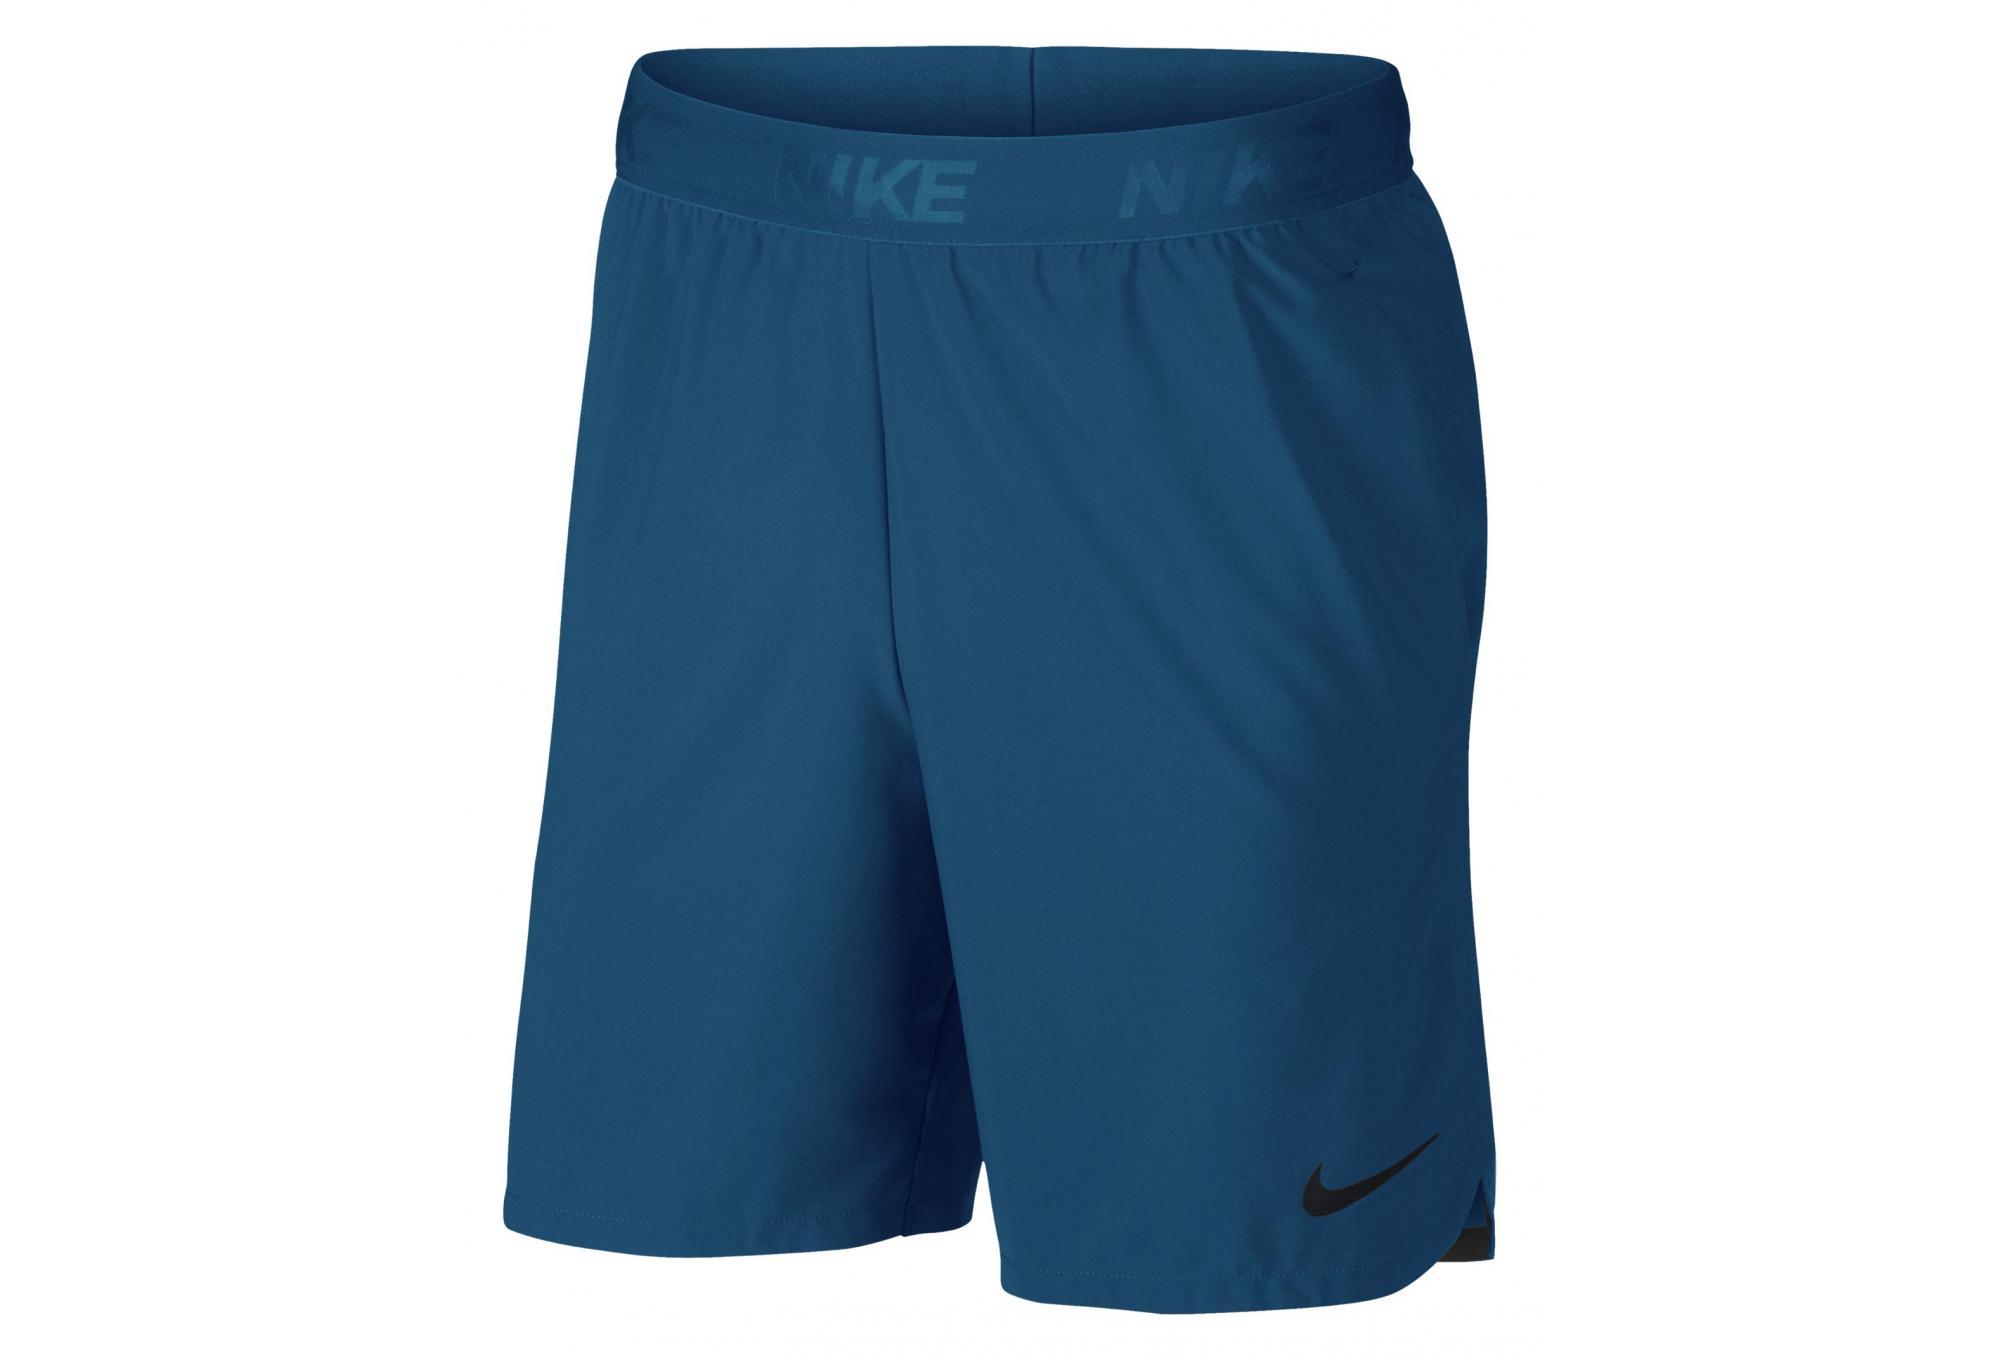 Nike Short Flex Training Bleu Homme